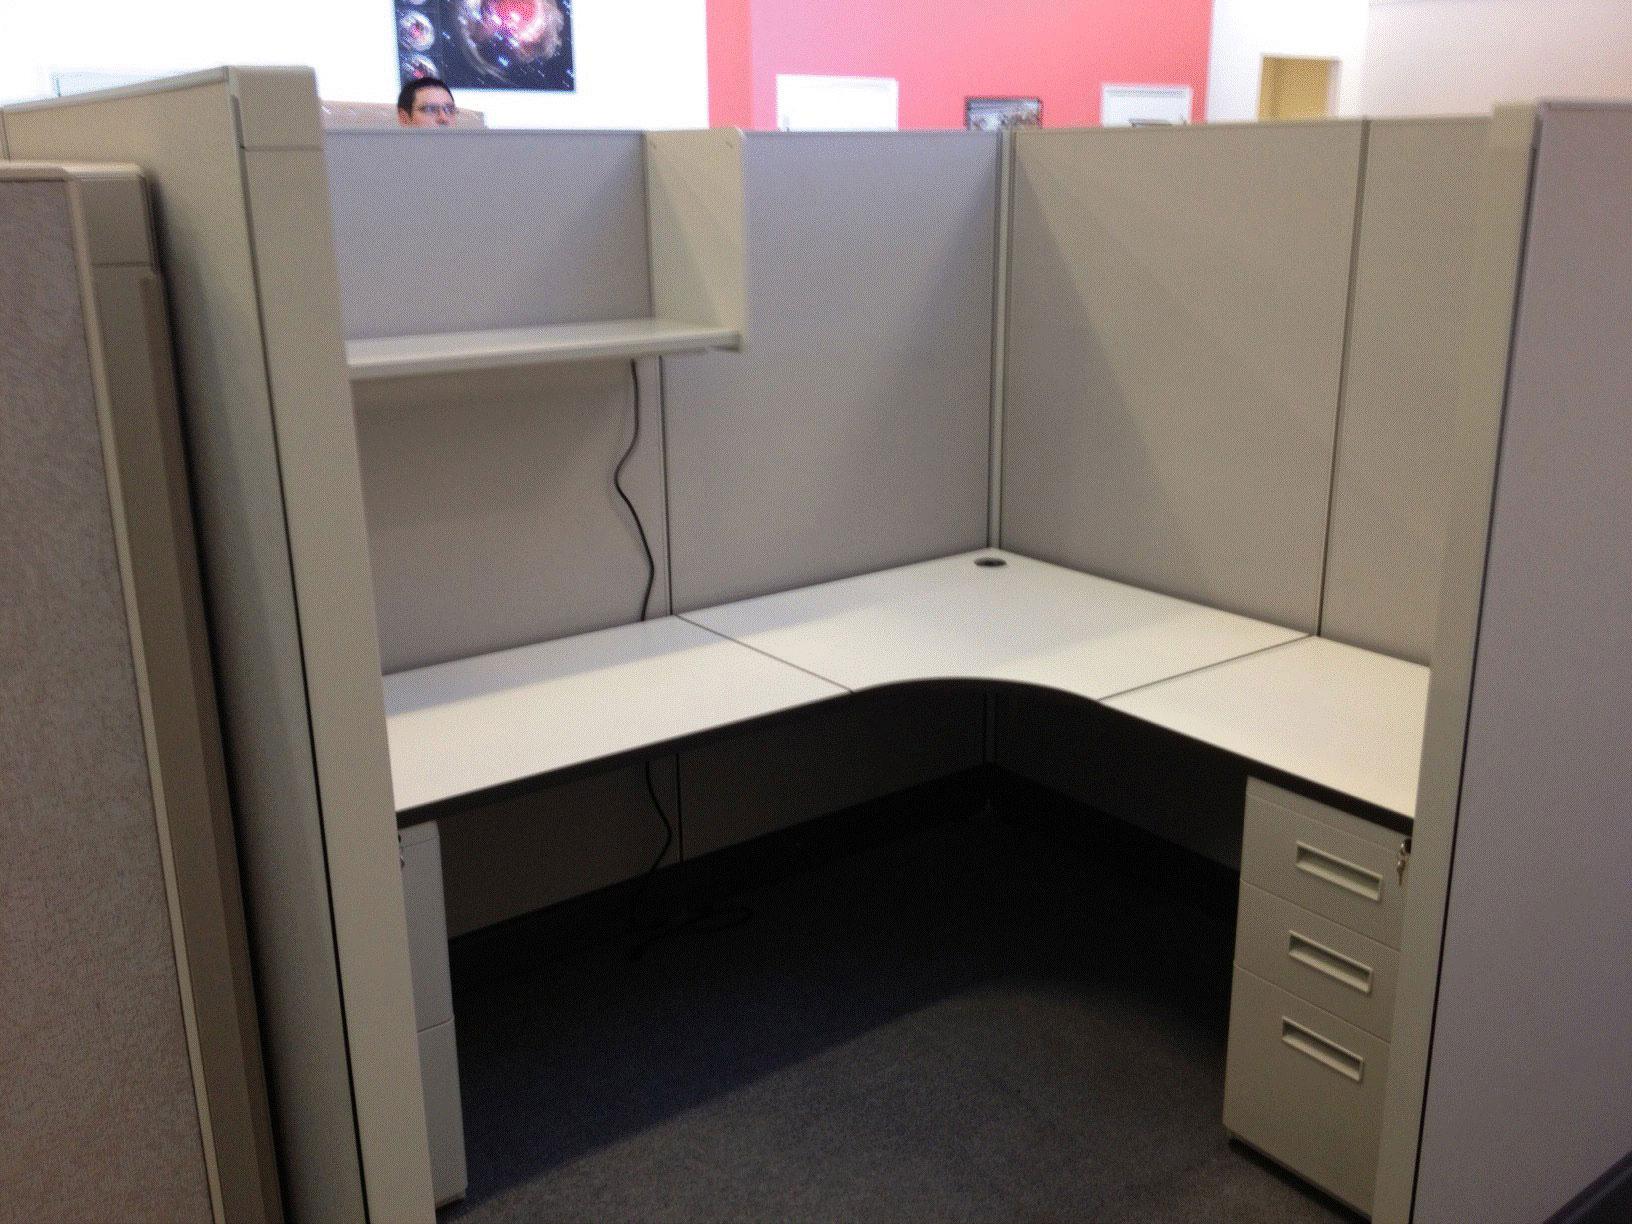 office-cubicles-for-sale-in-bonita-spring-florida-3-3.jpg